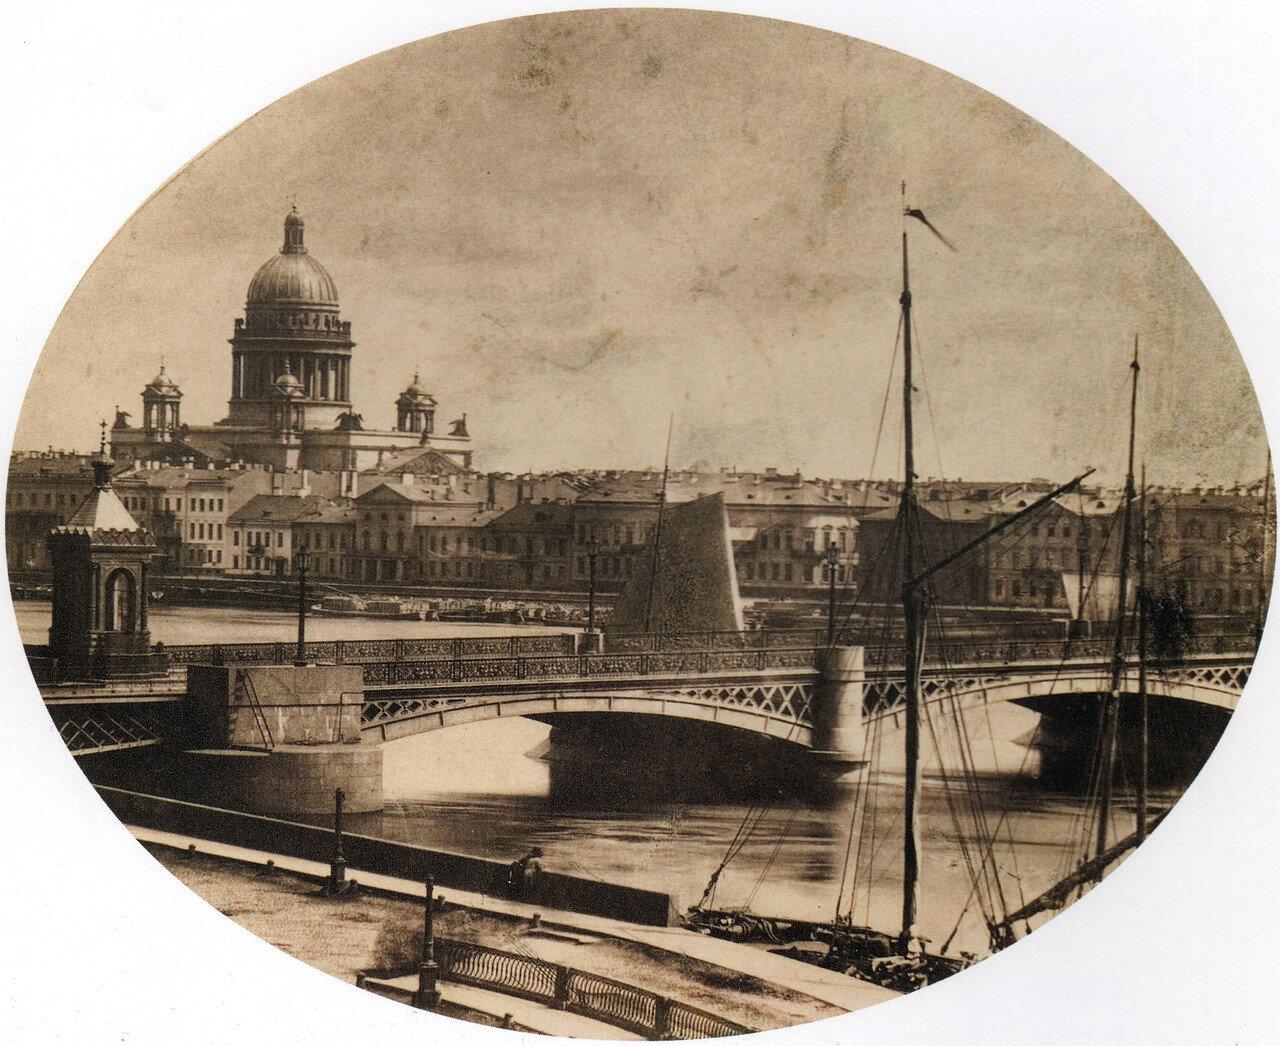 Вид на Николаевский мост и Исаакиевский собор,1880-е